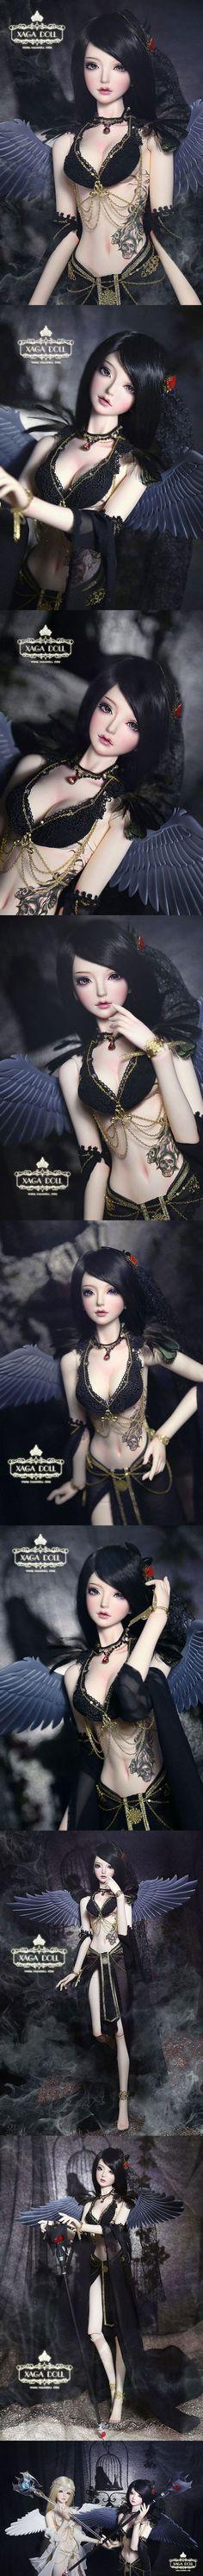 BJD Limited Item Black Angle Zenobia Girl 65cm Ball-Jointed Doll_58 ~65cm doll_XAGA DOLL-_DOLL_Ball Jointed Dolls (BJD) company-Legenddoll